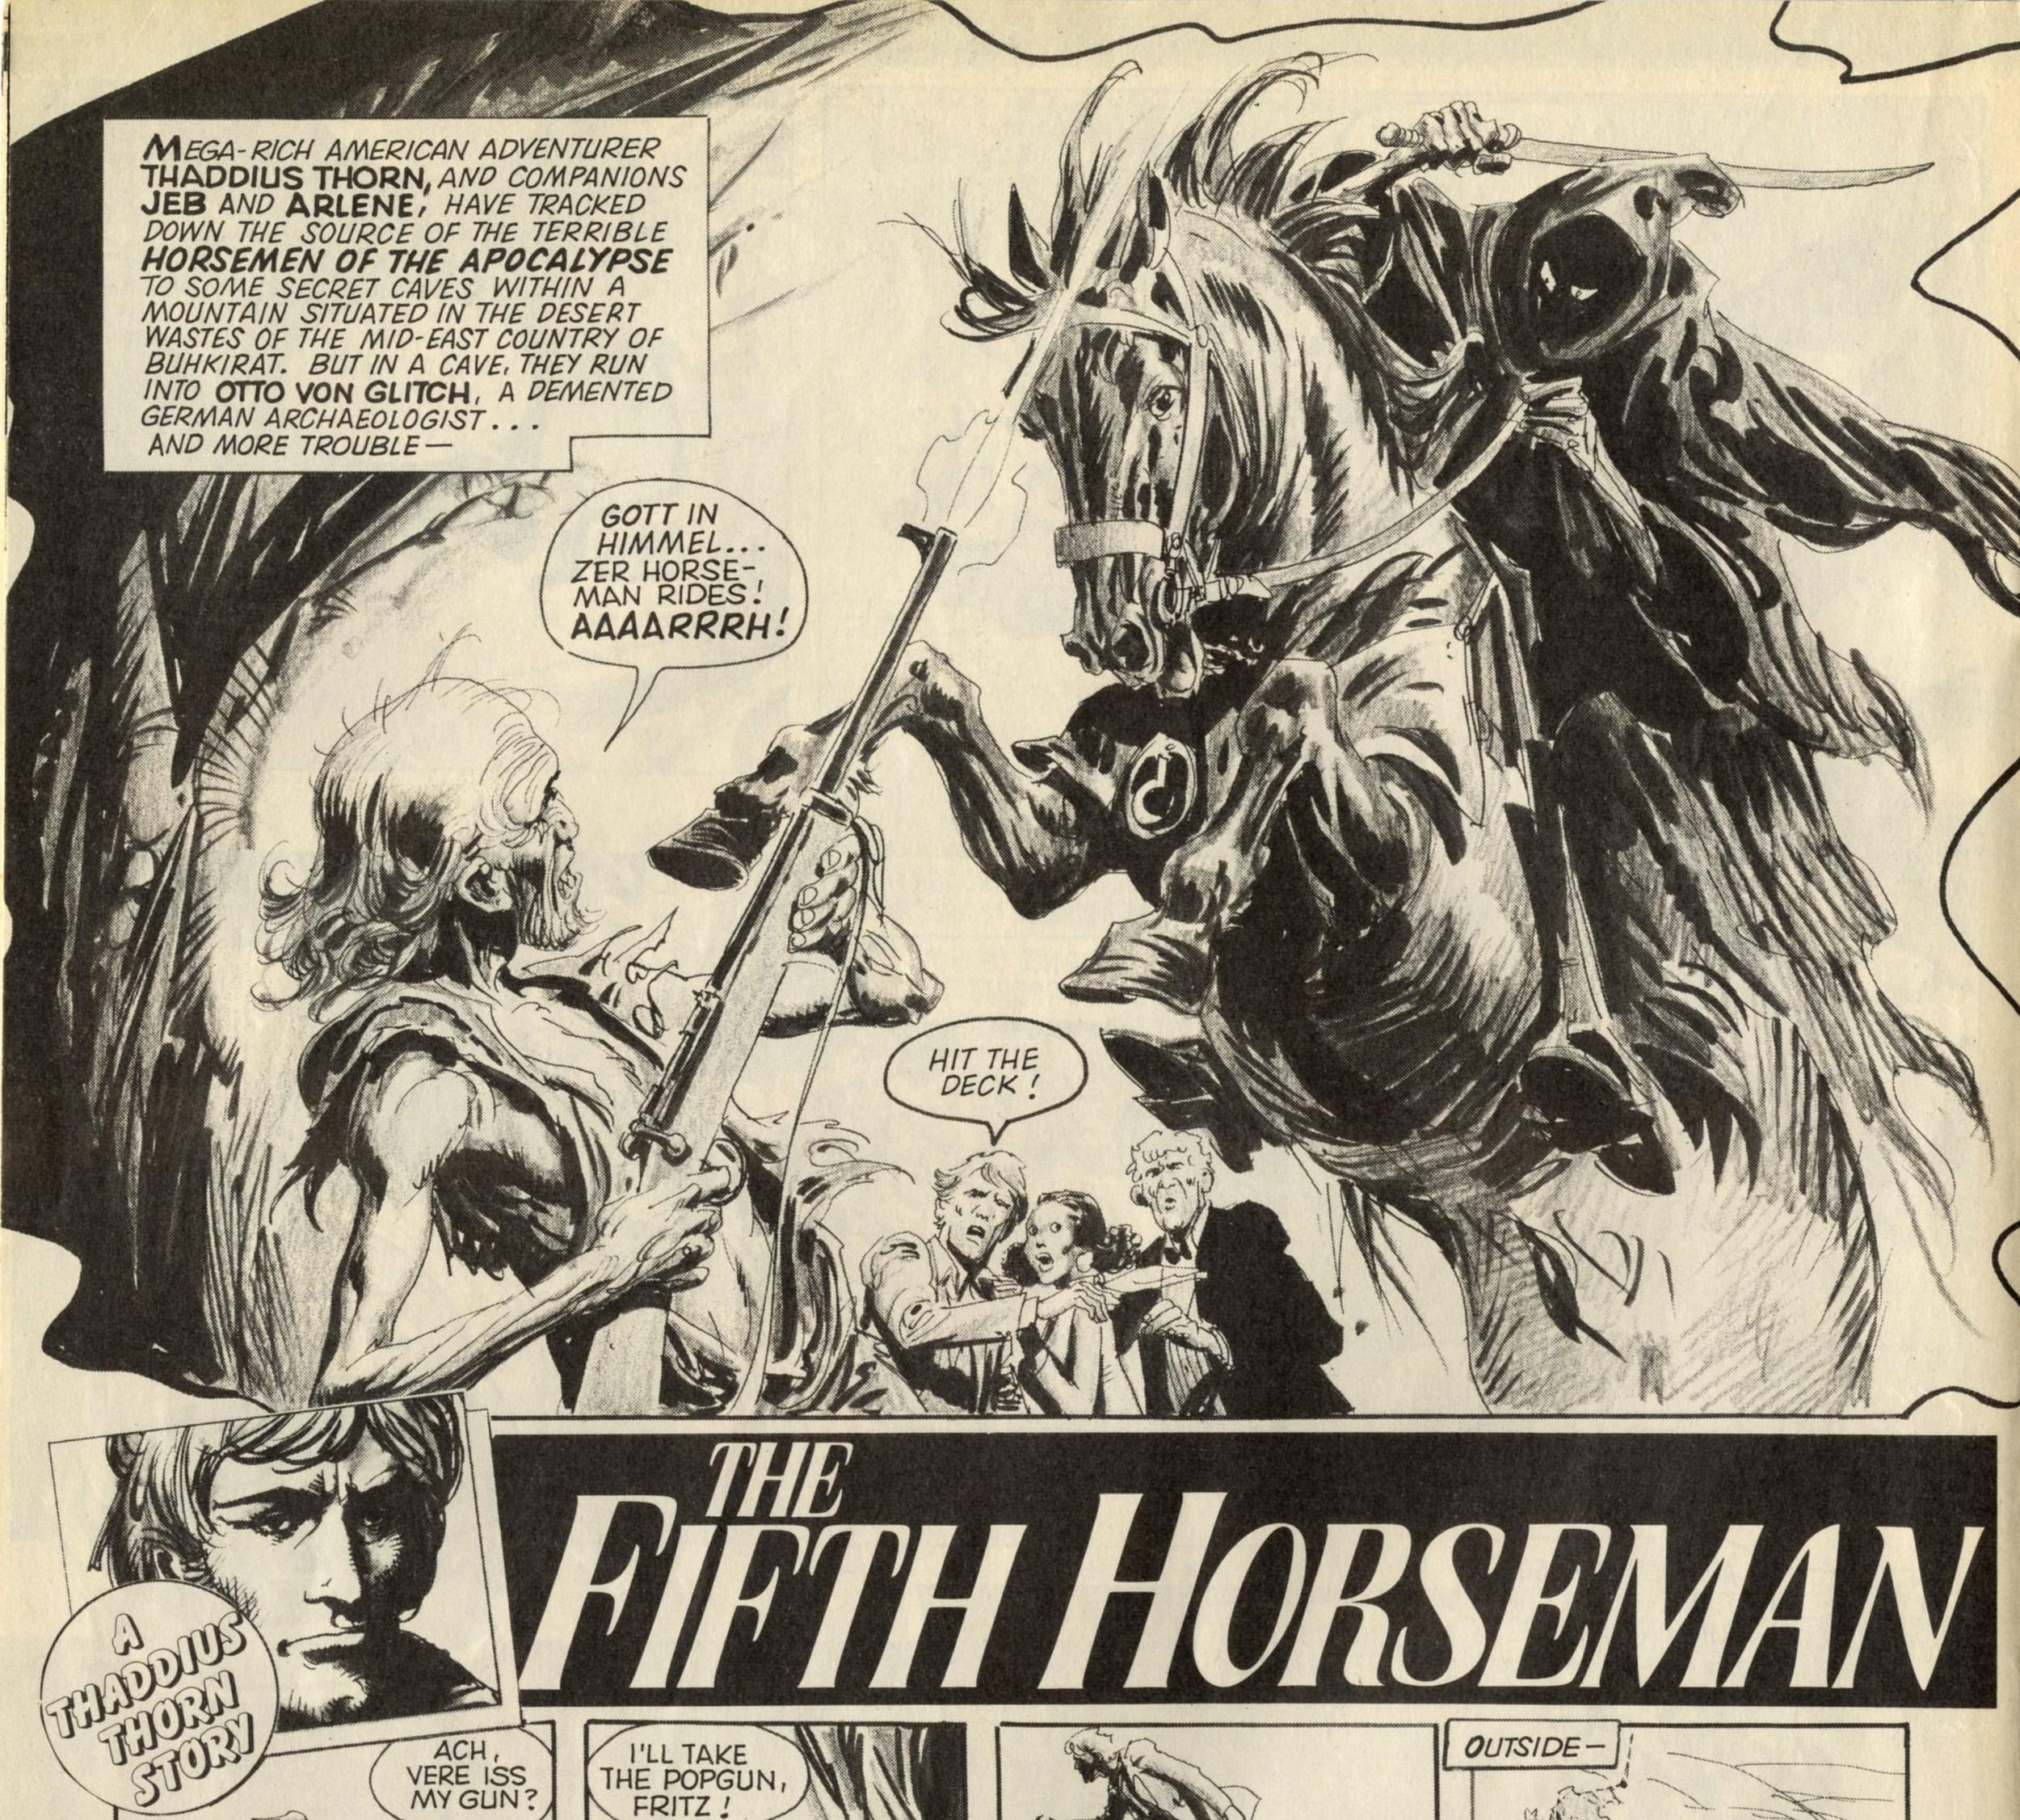 The Fifth Horseman: Alan Hebden (writer), Jose Ortiz (artist)